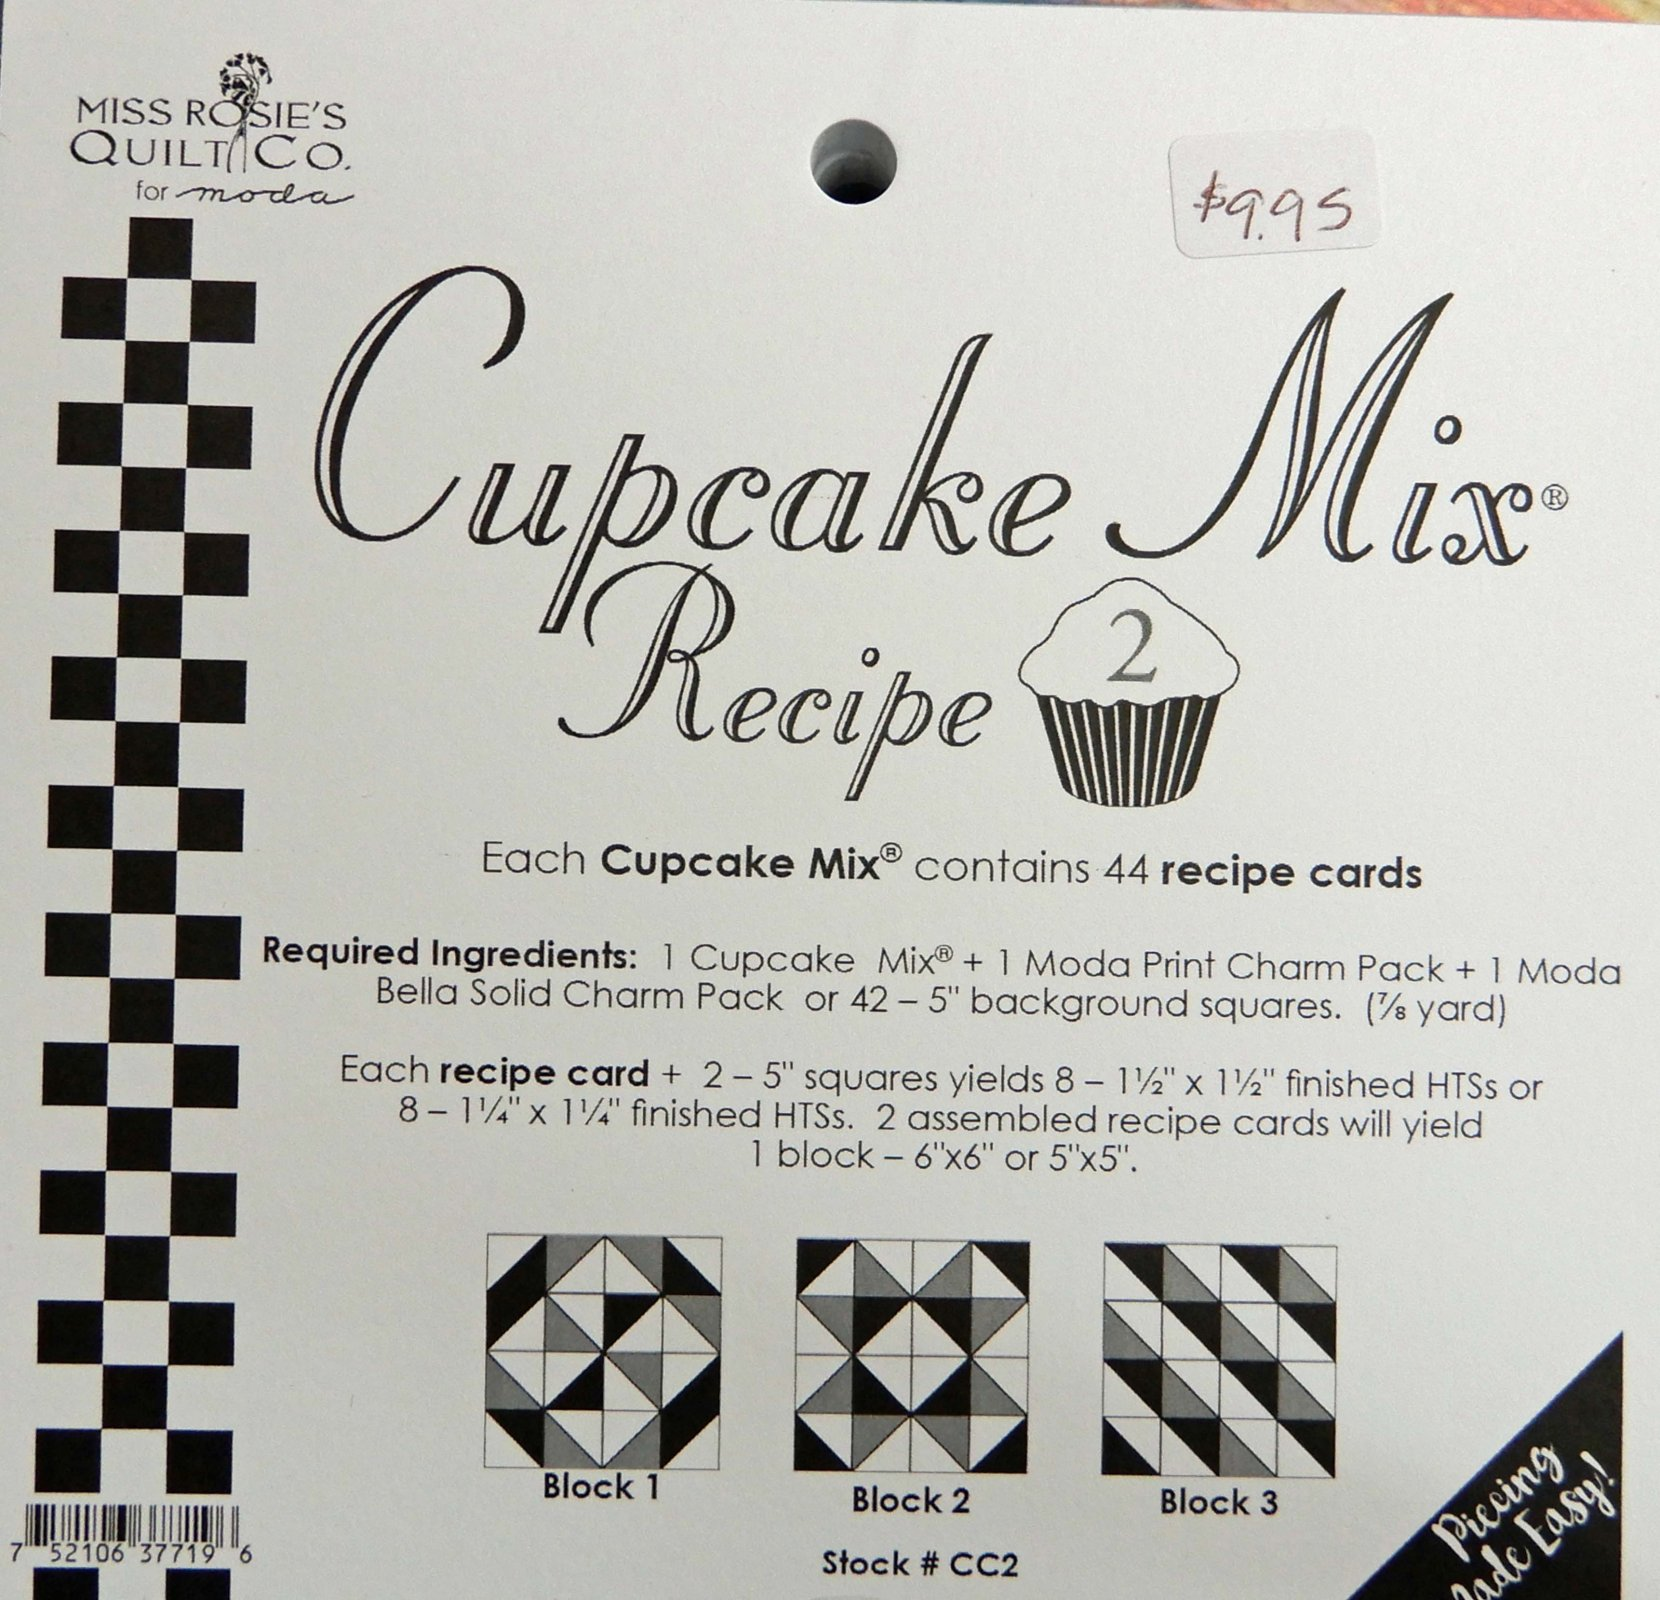 Cupcake Recipe volume 2